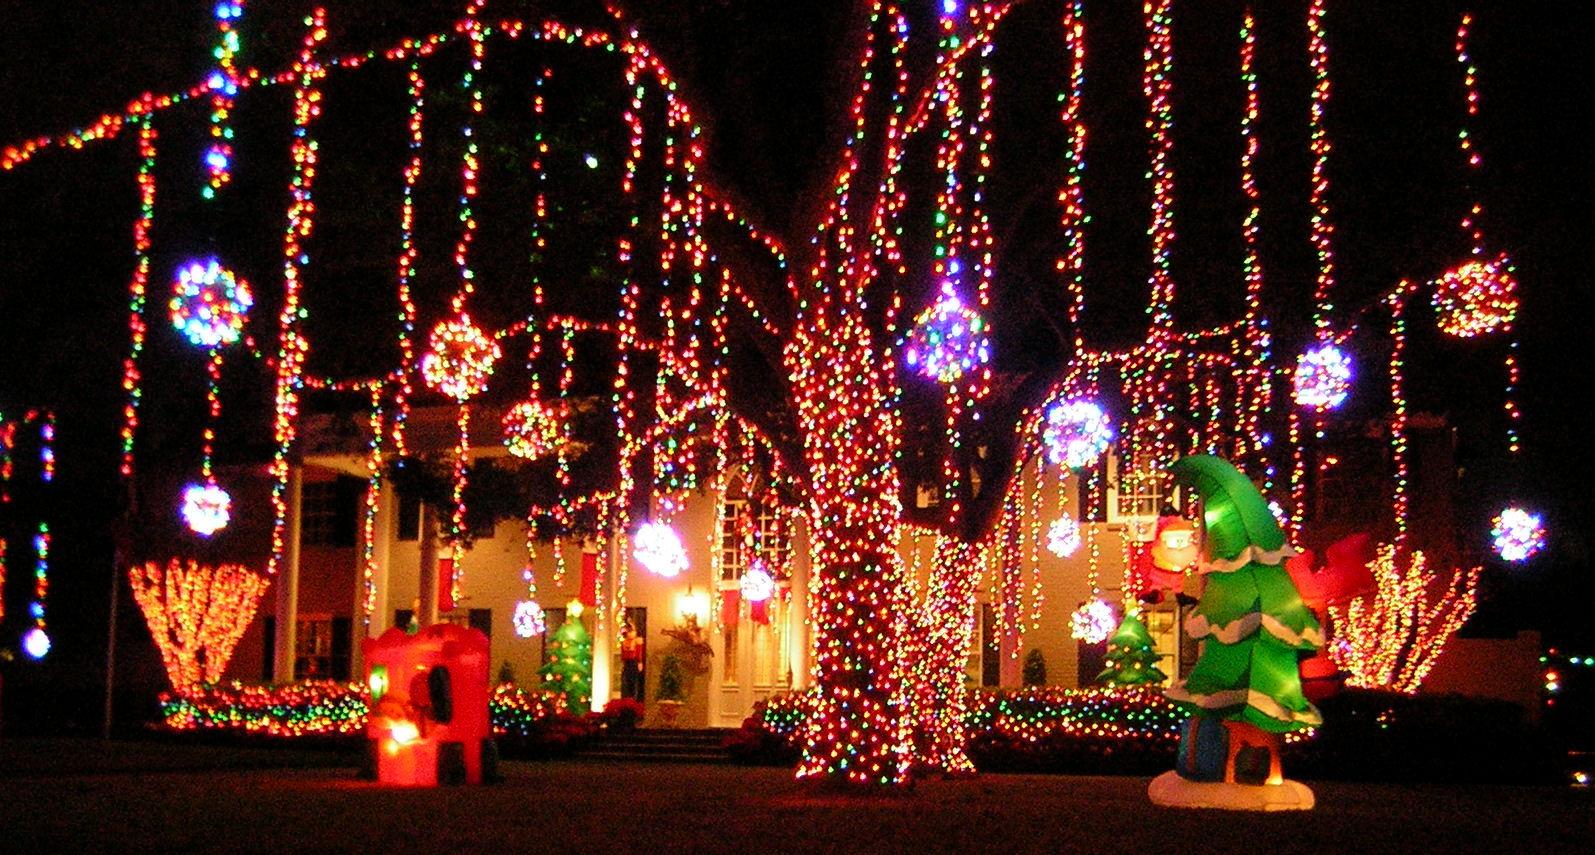 The Artful Dodger: Christmas Lights in River Oaks